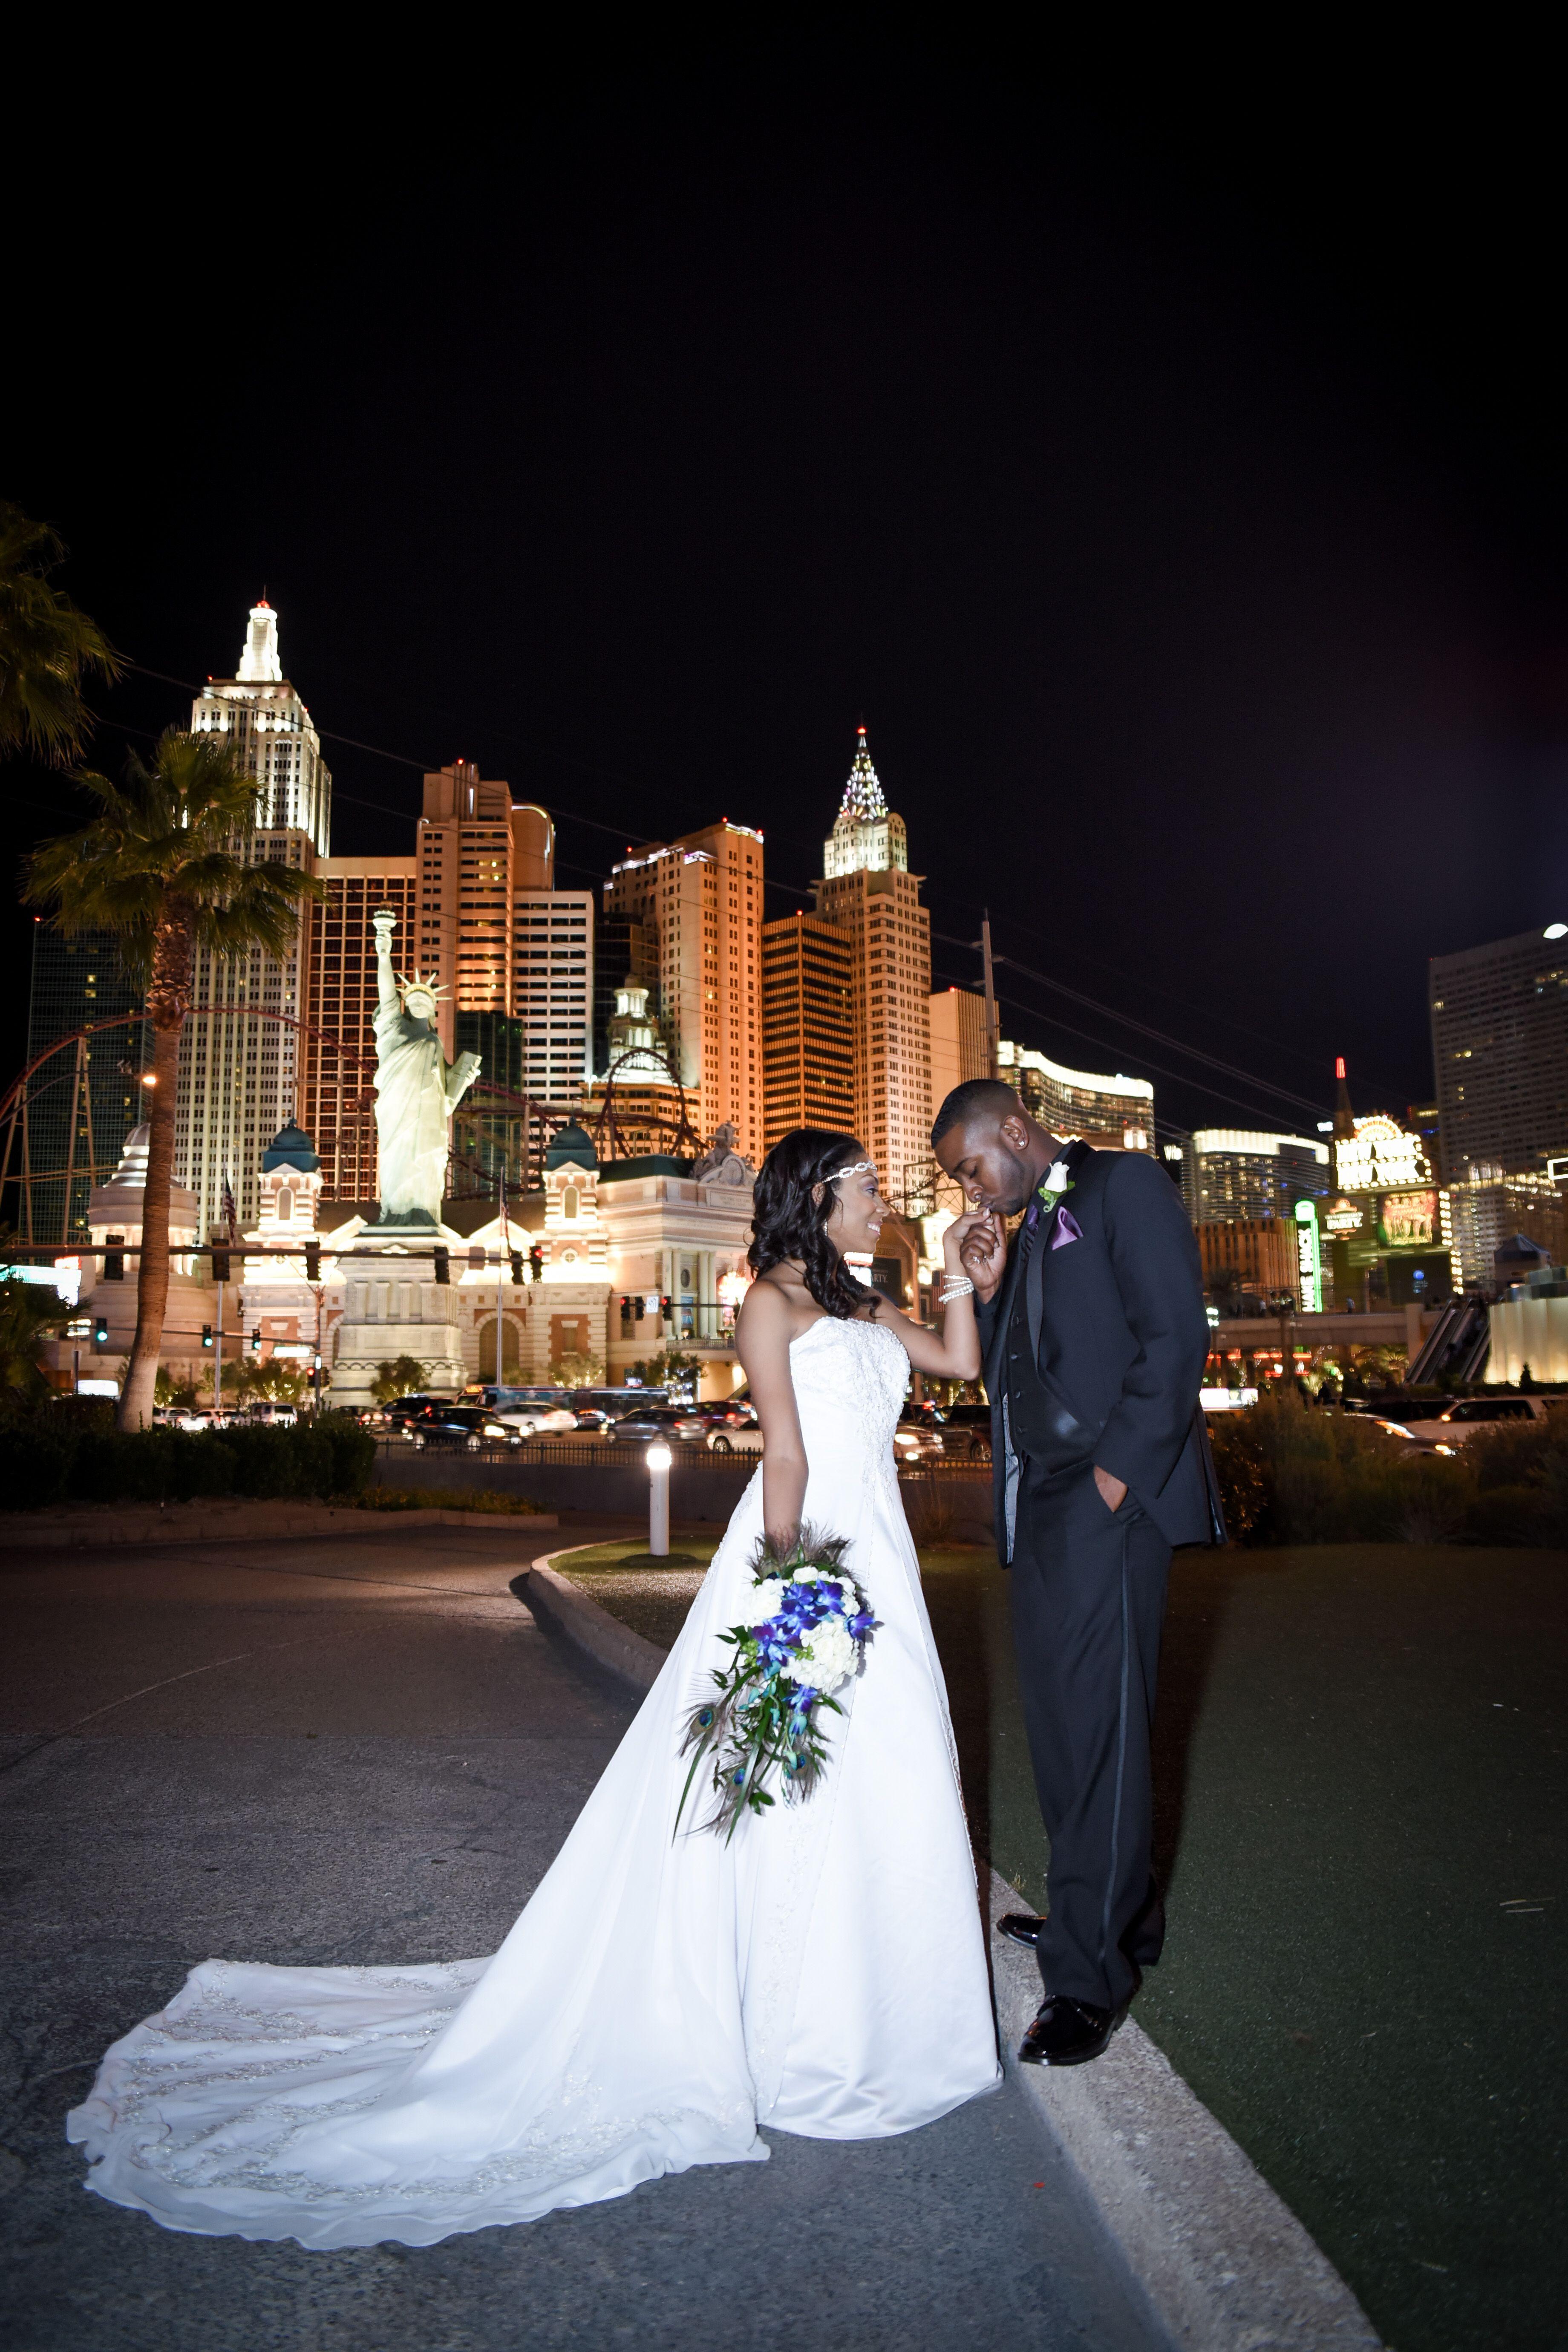 Tropicana Lv Weddings Las Vegas Wedding Chapel Tropical Chapels Weddingphotography